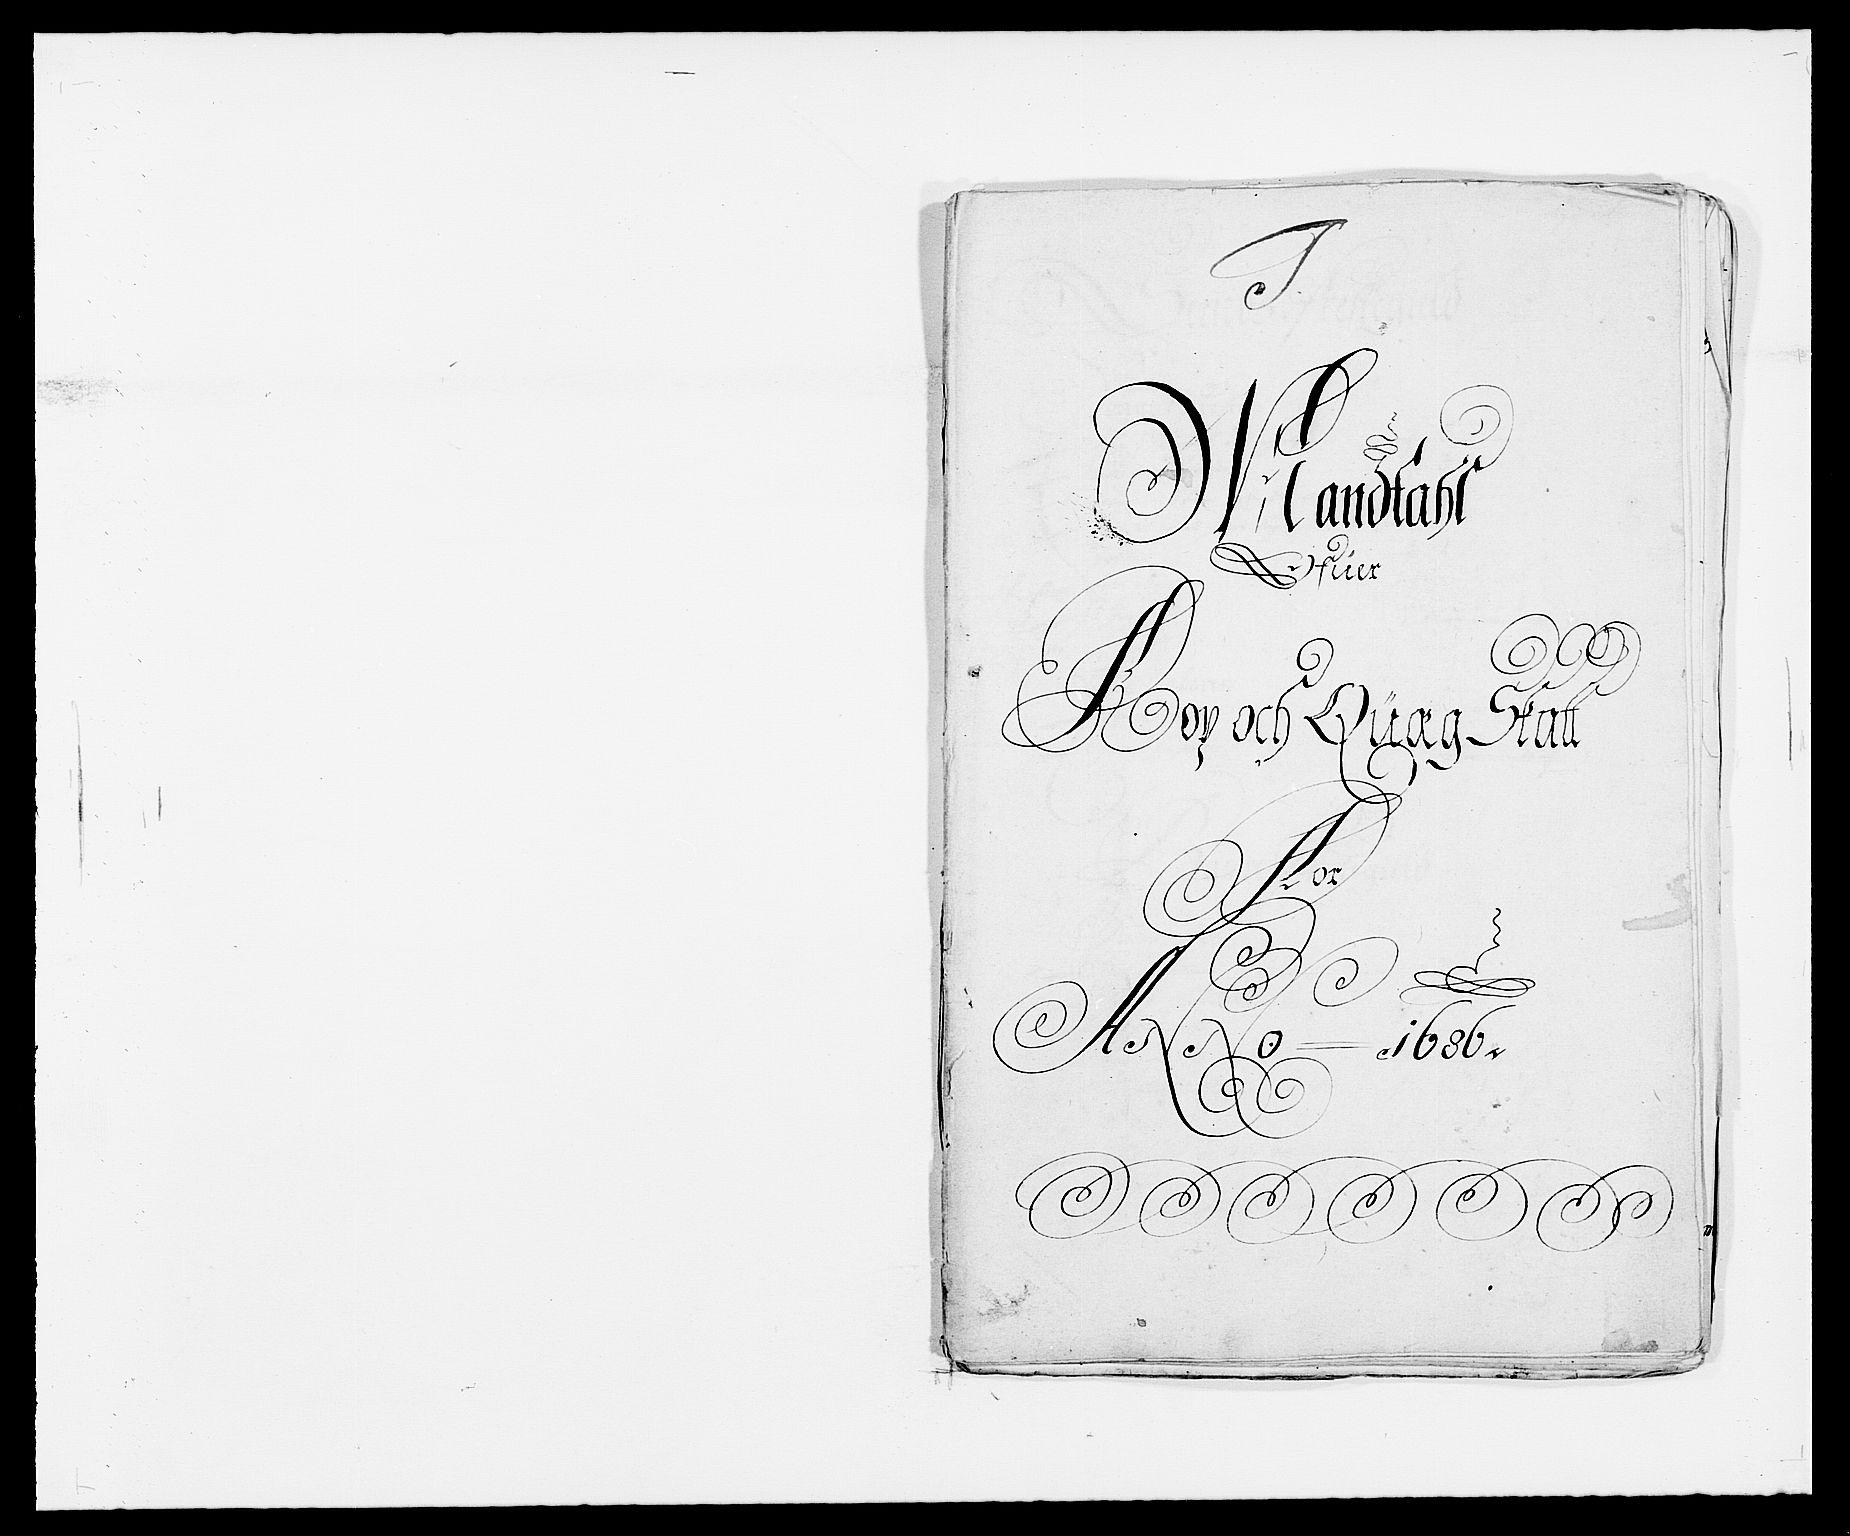 RA, Rentekammeret inntil 1814, Reviderte regnskaper, Fogderegnskap, R32/L1857: Fogderegnskap Jarlsberg grevskap, 1686-1690, s. 394